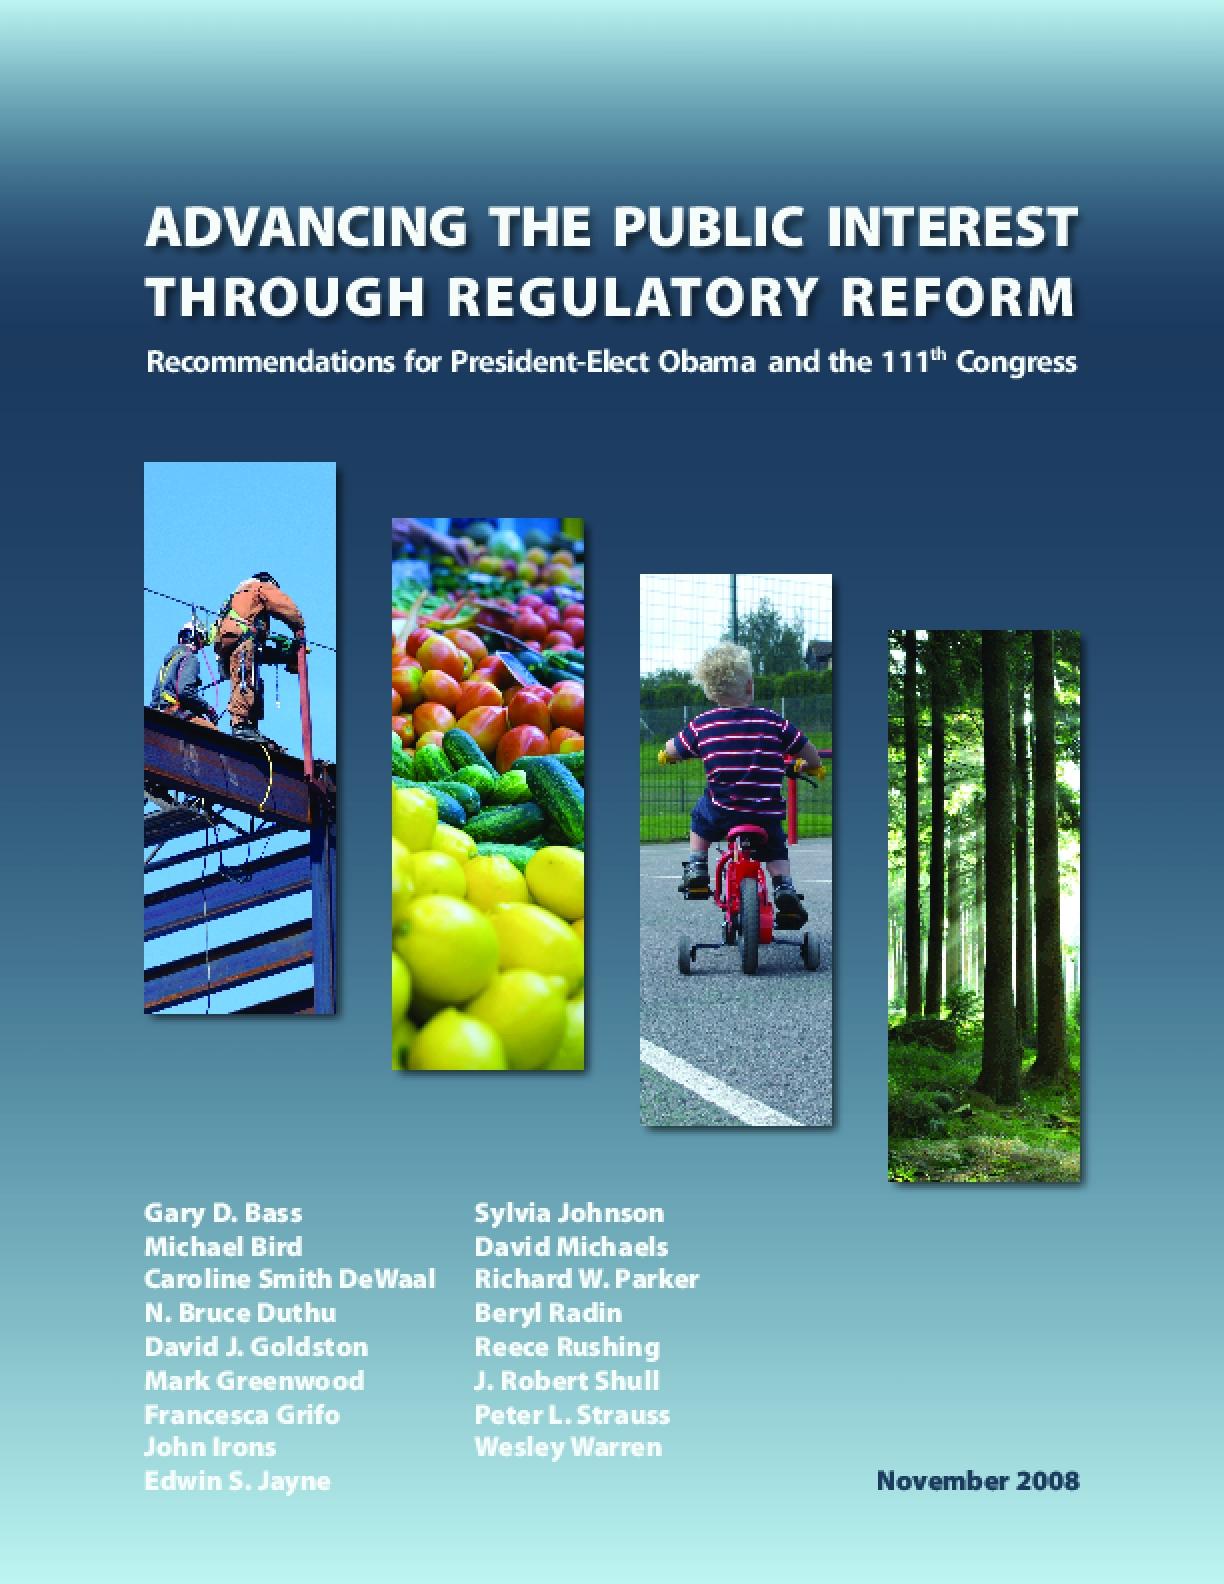 Advancing the Public Interest Through Regulatory Reform